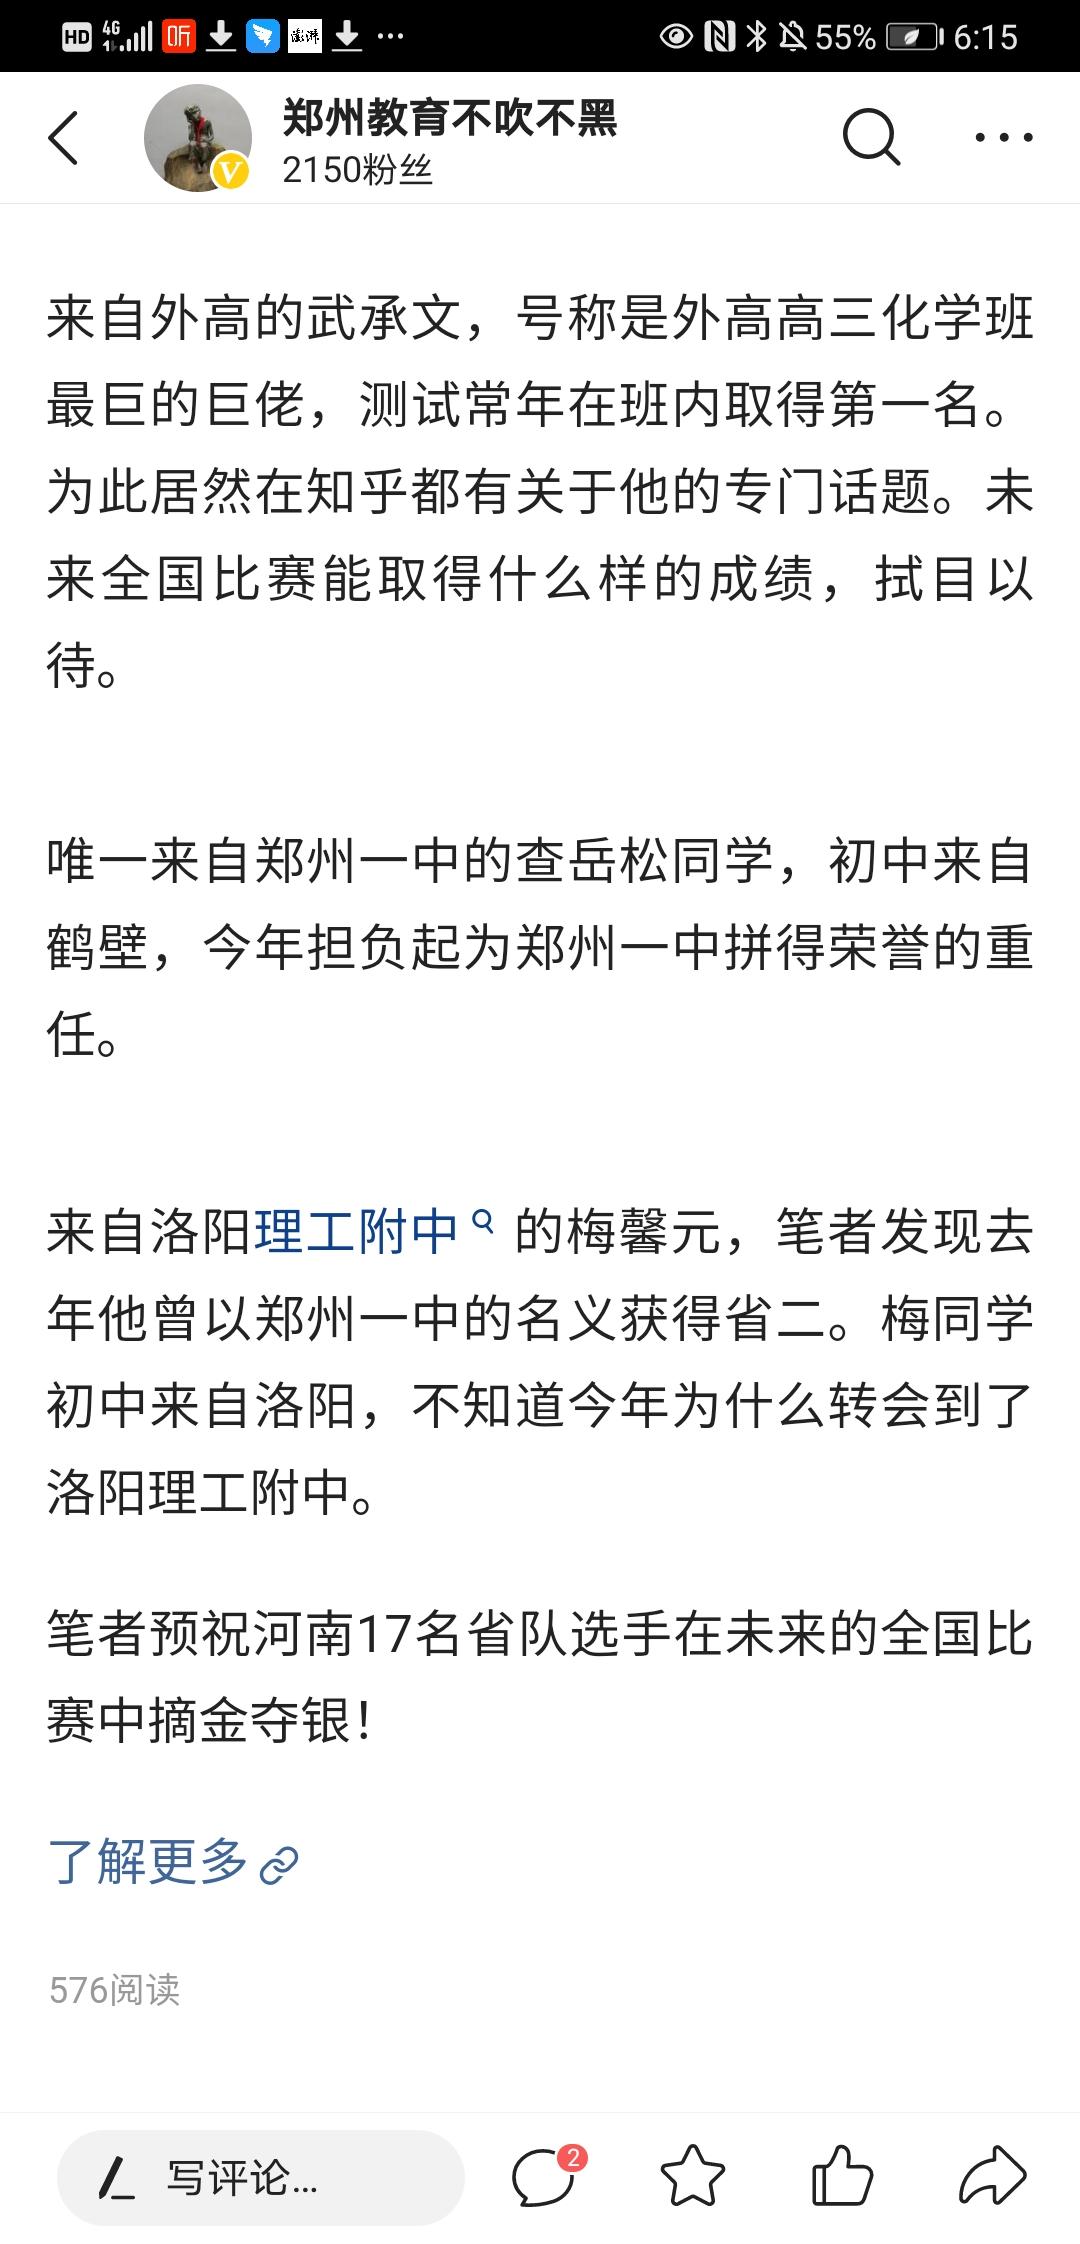 Screenshot_20201018_181538_com.ss.android.article.news.jpg